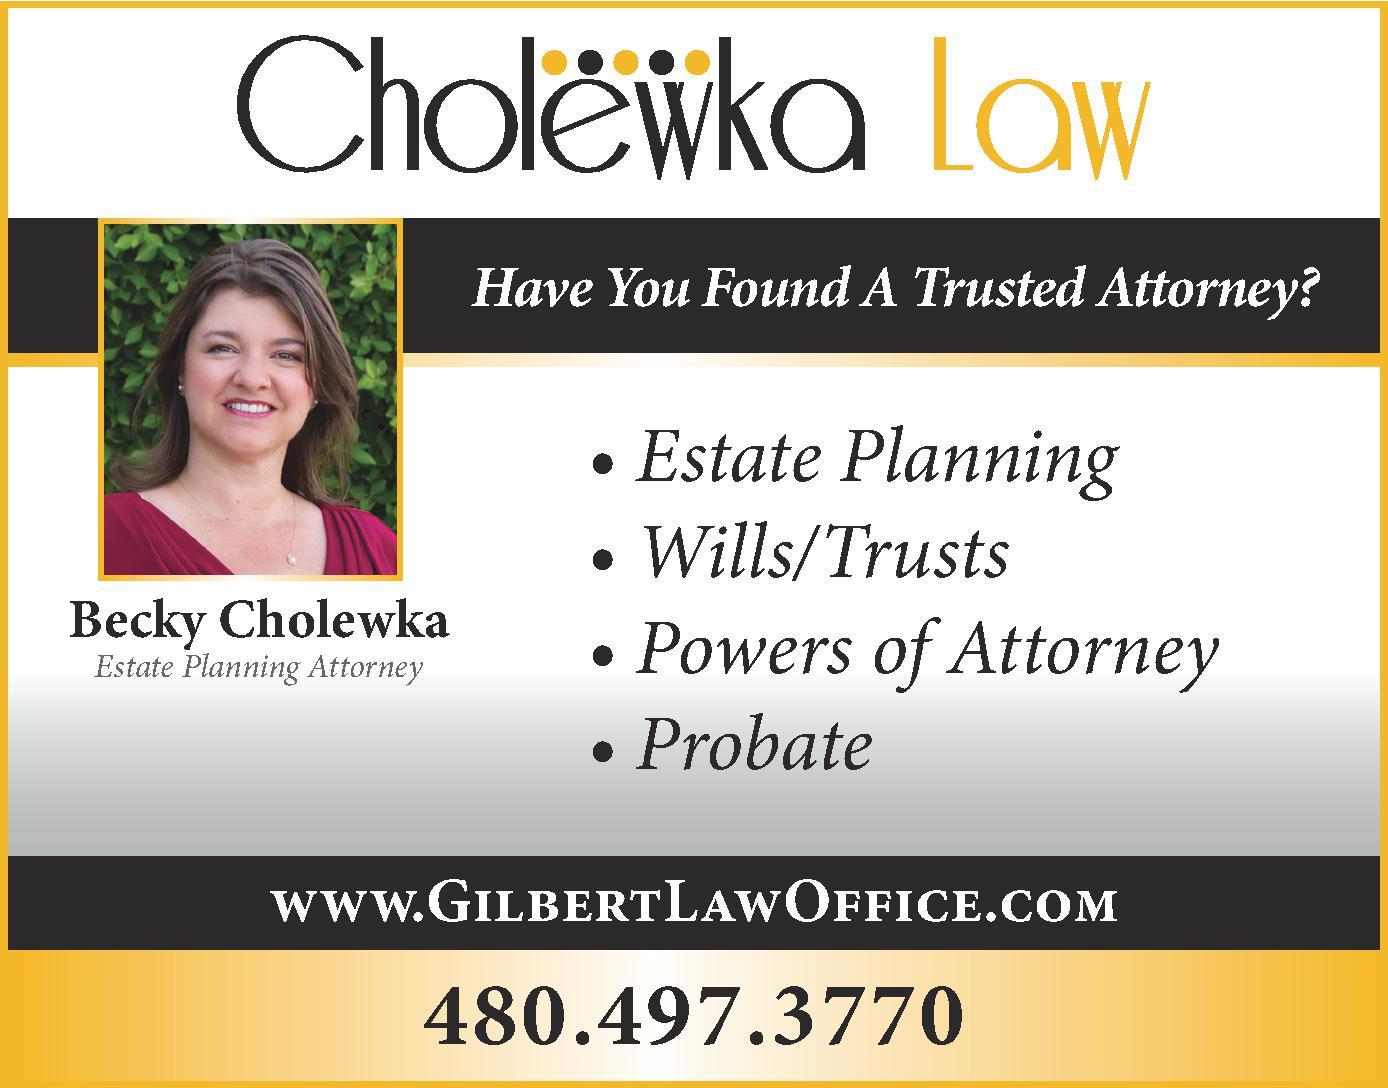 Cholewka Law